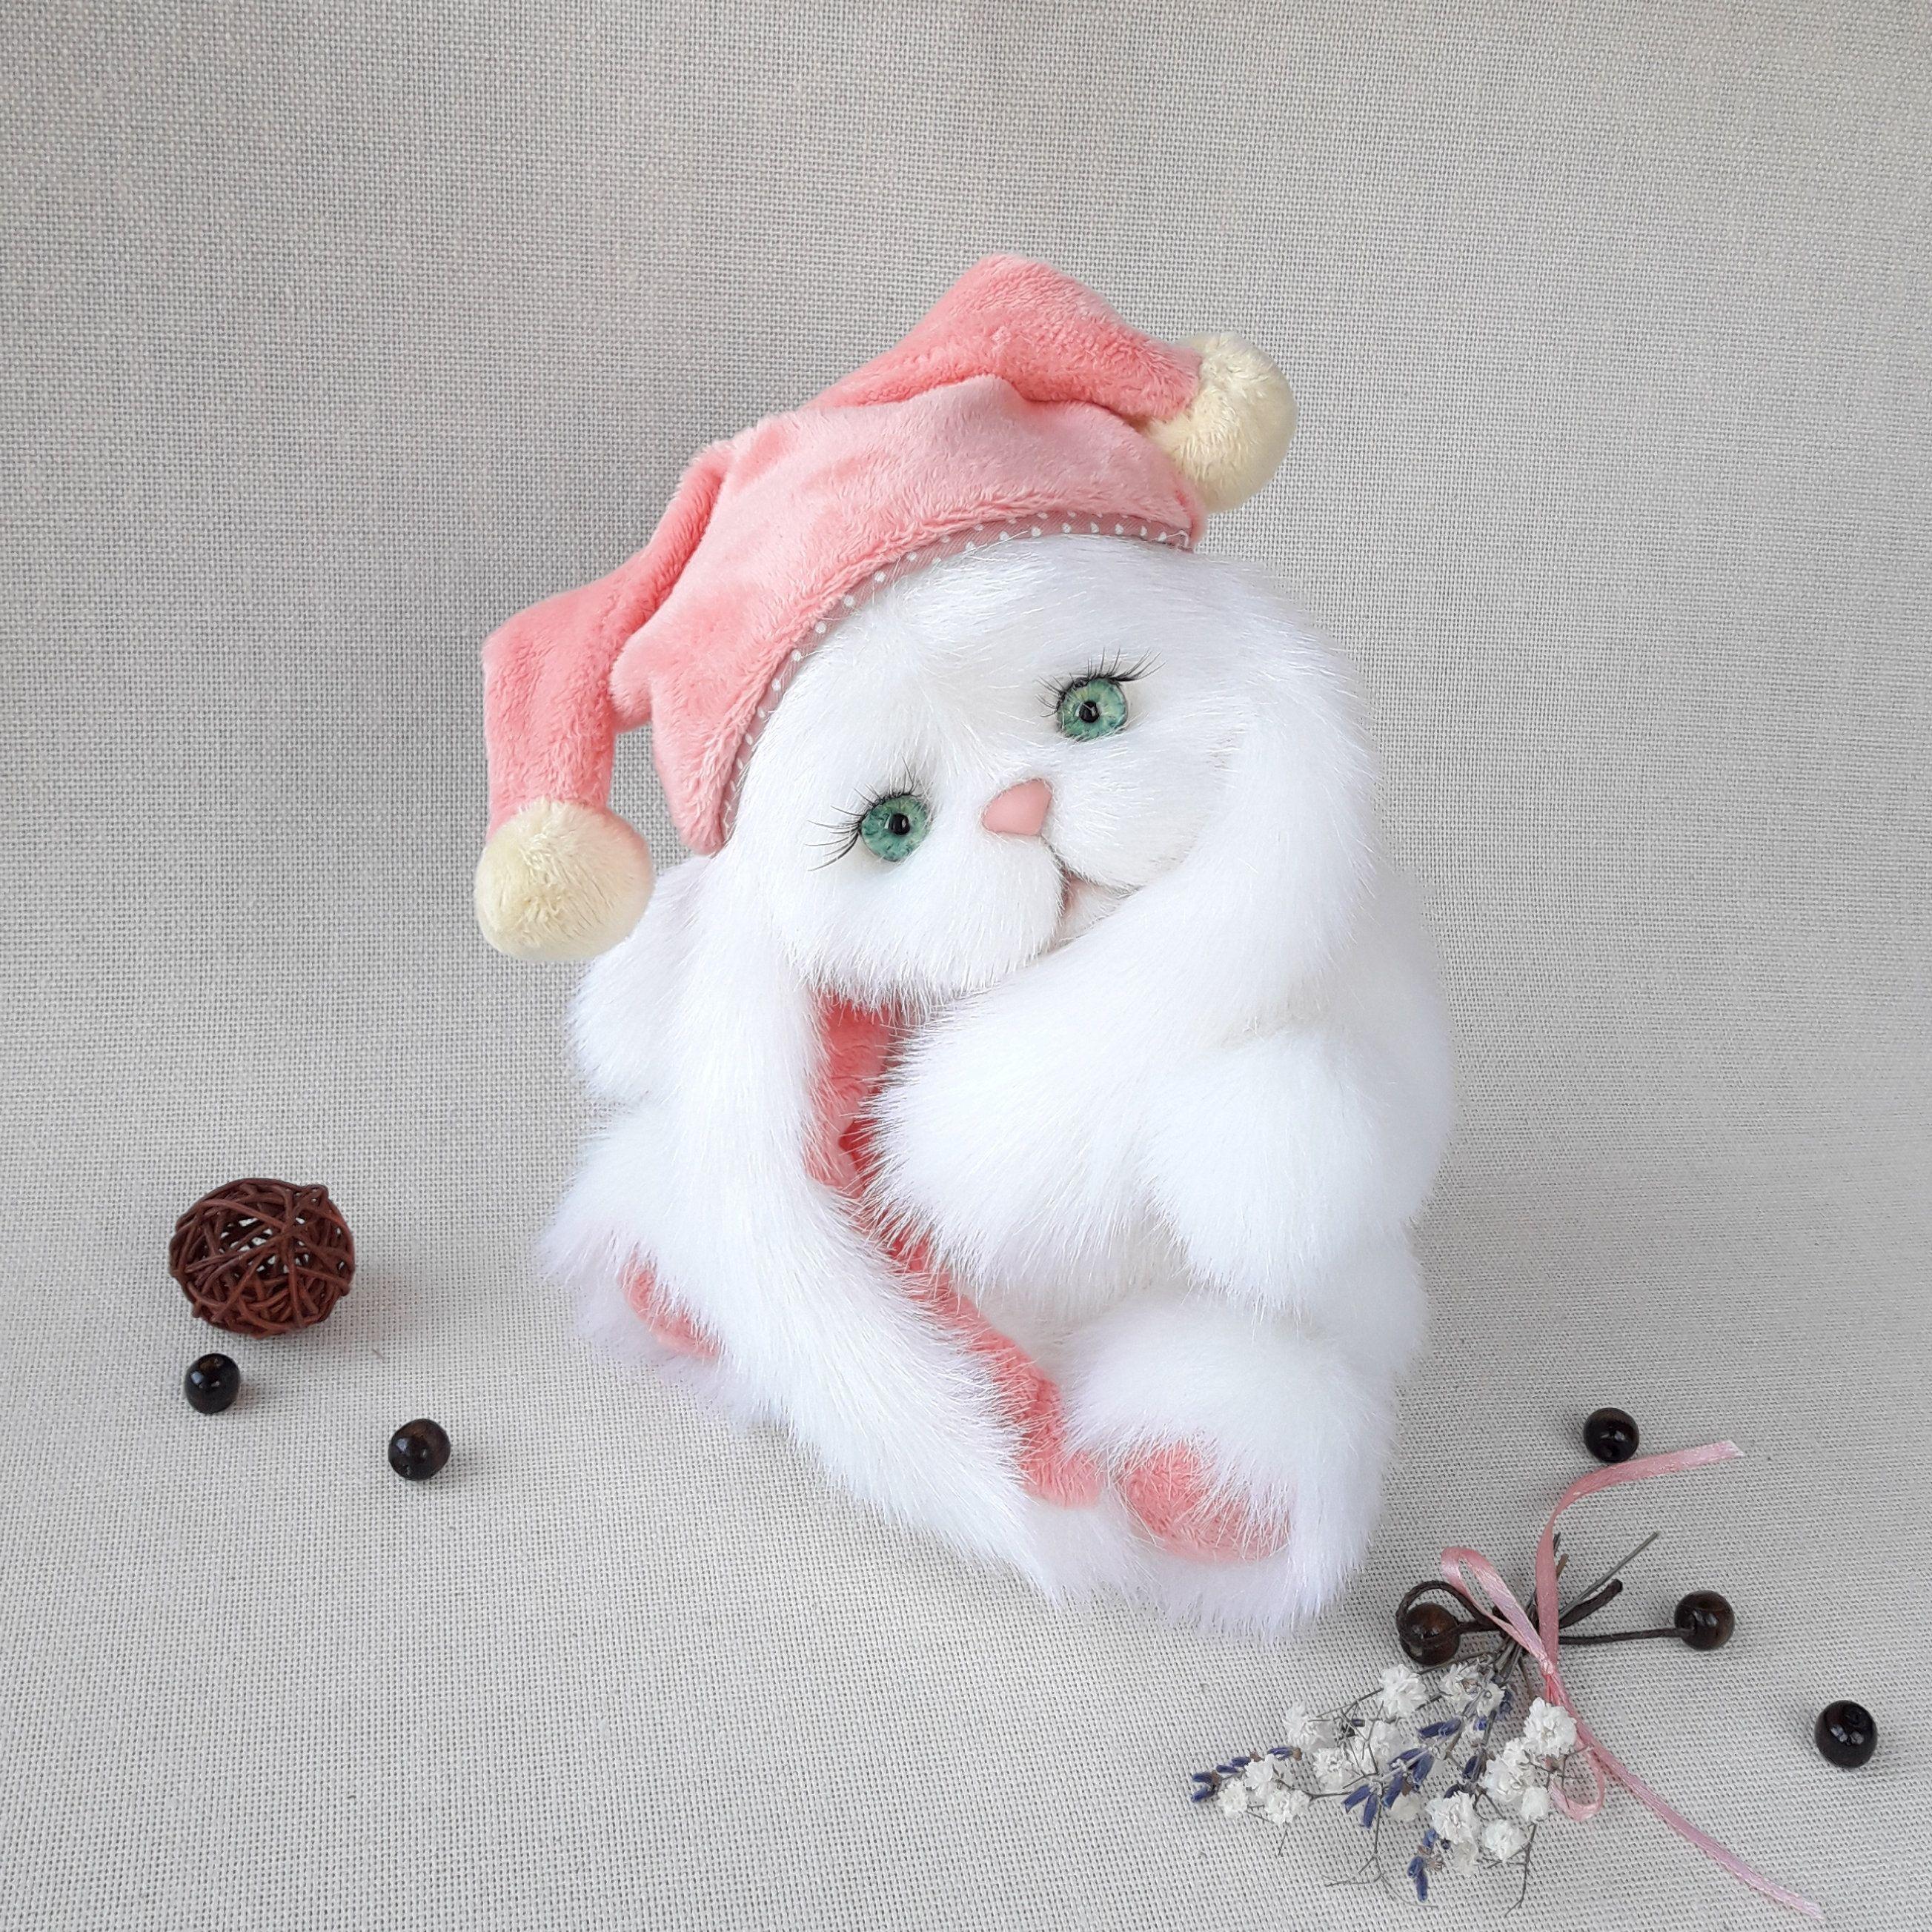 Plush bunny bunny Teddy/'s friends toy gift handmade bunny  White Bunny Teddy bears Birthday present Interior toy teddy cat make to order